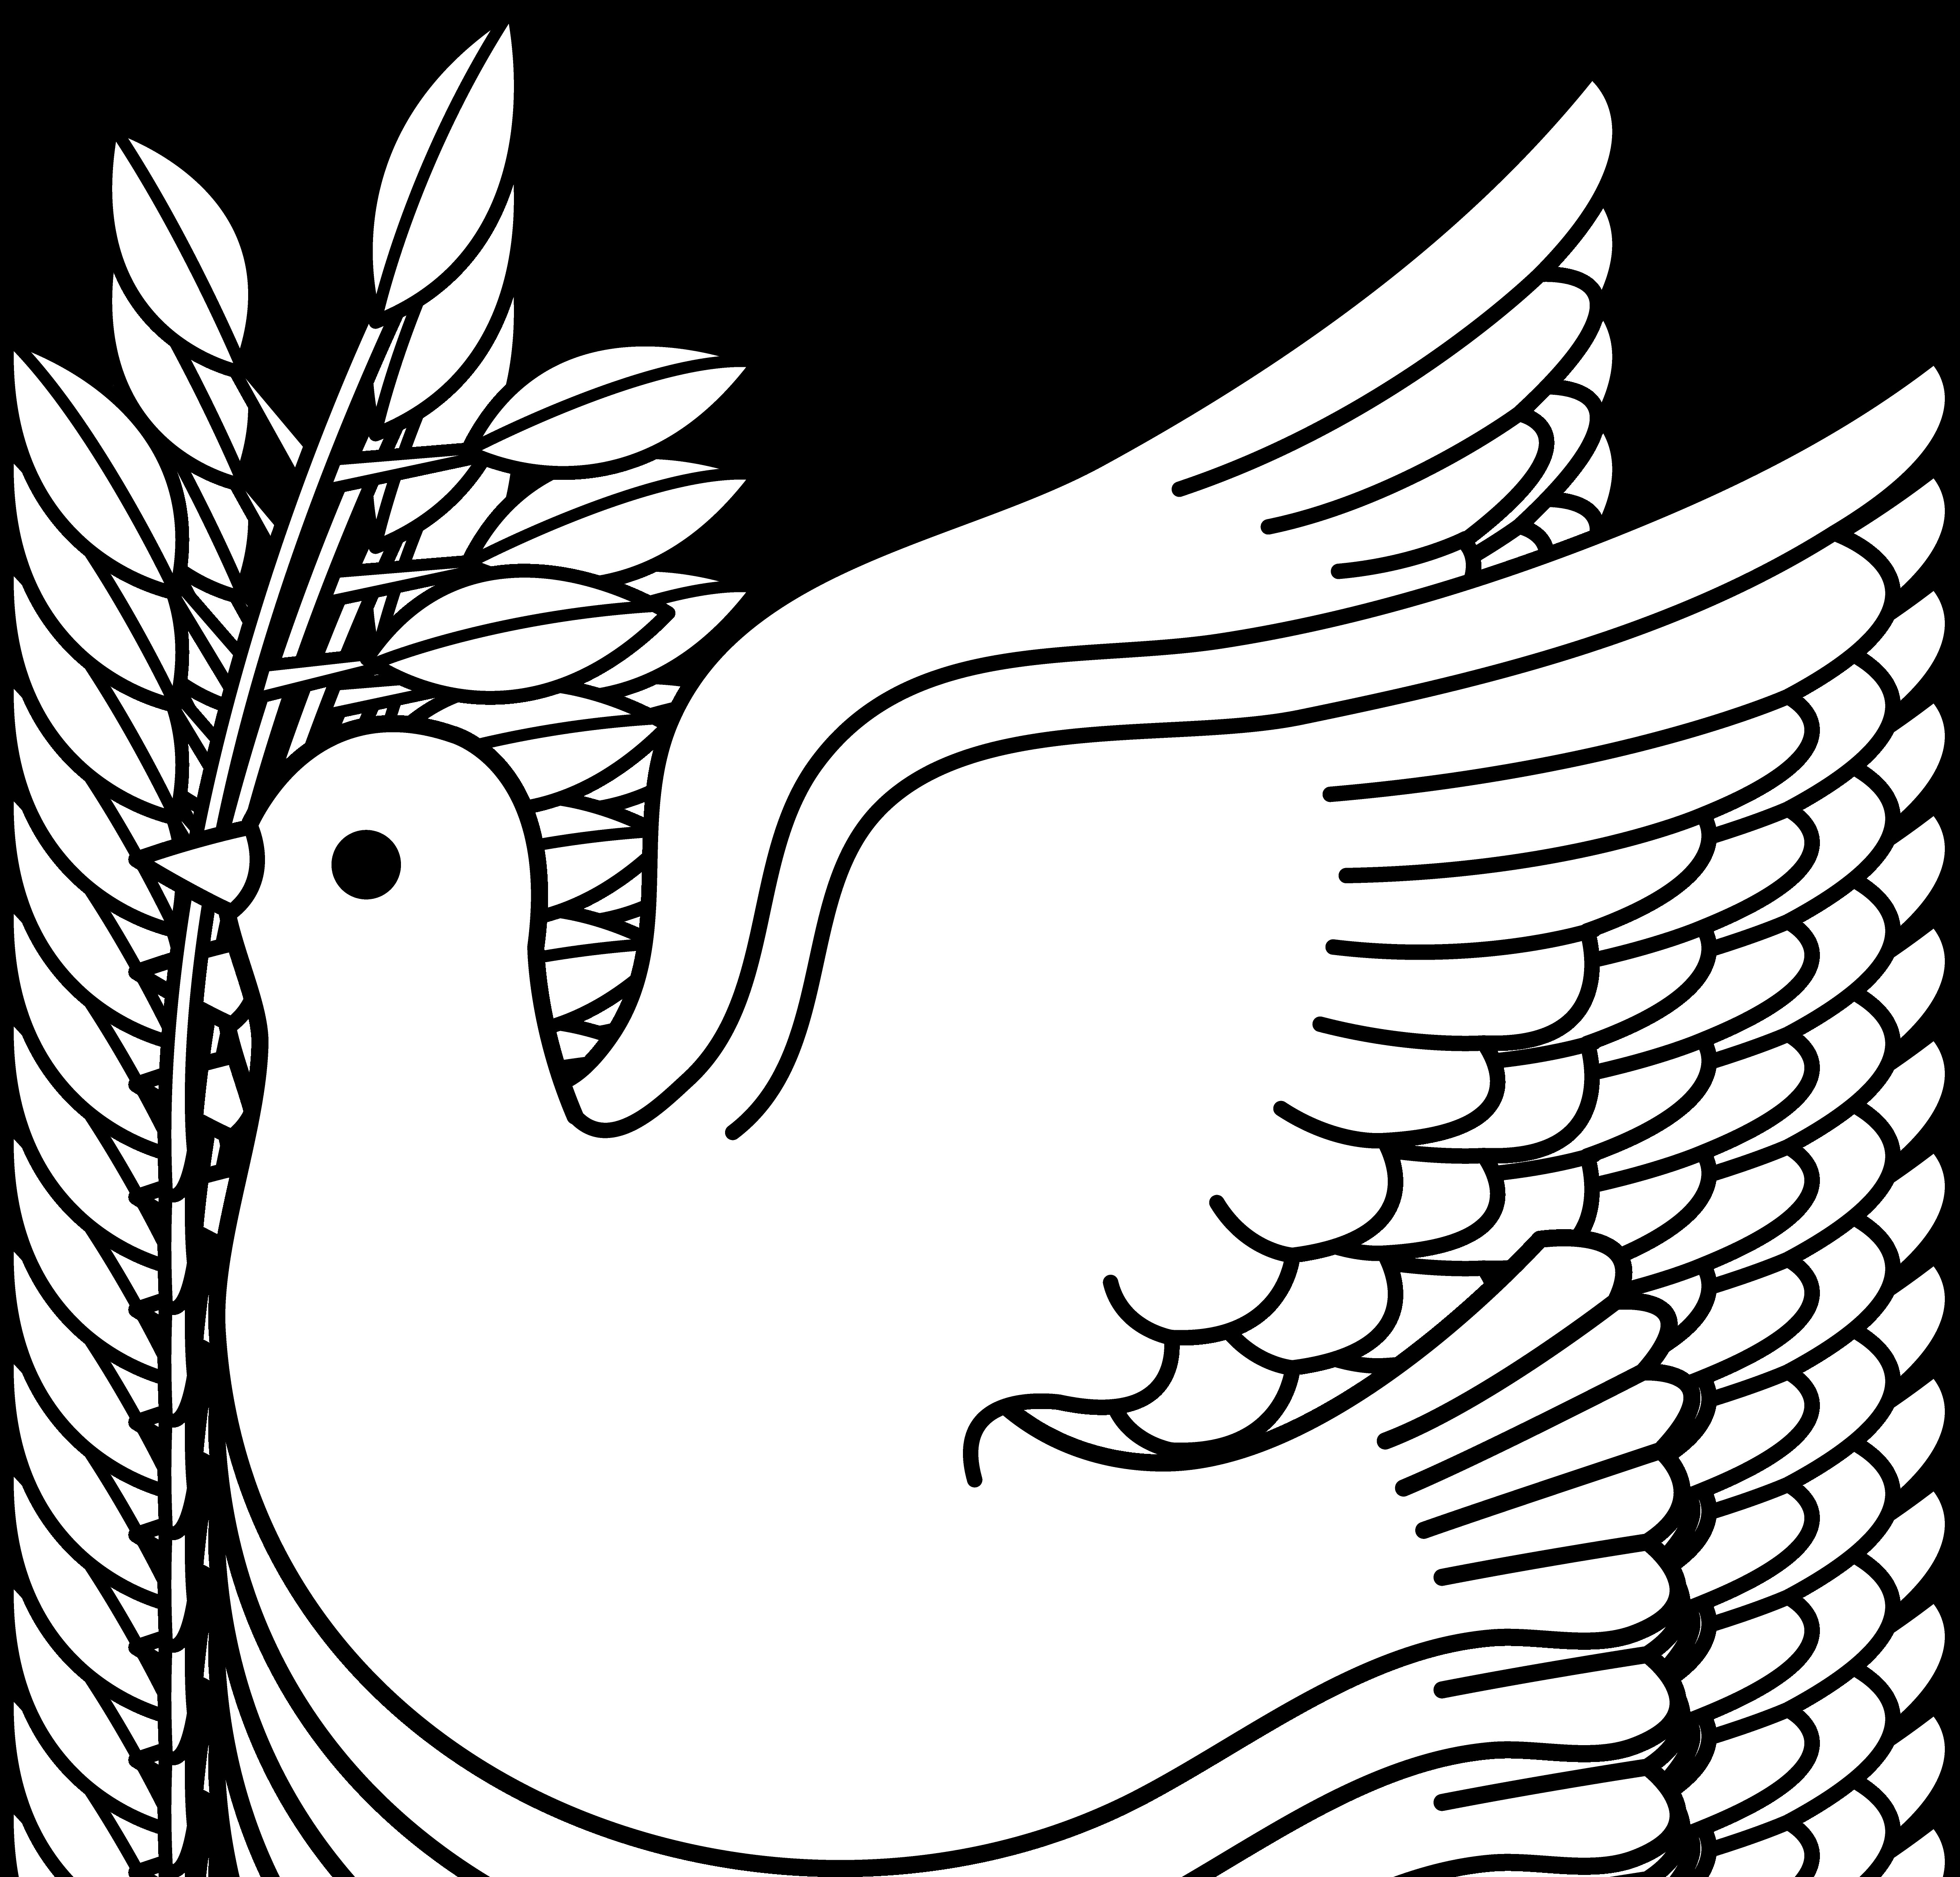 4771x4569 Christian Clip Art Dove Hd Clipart Panda